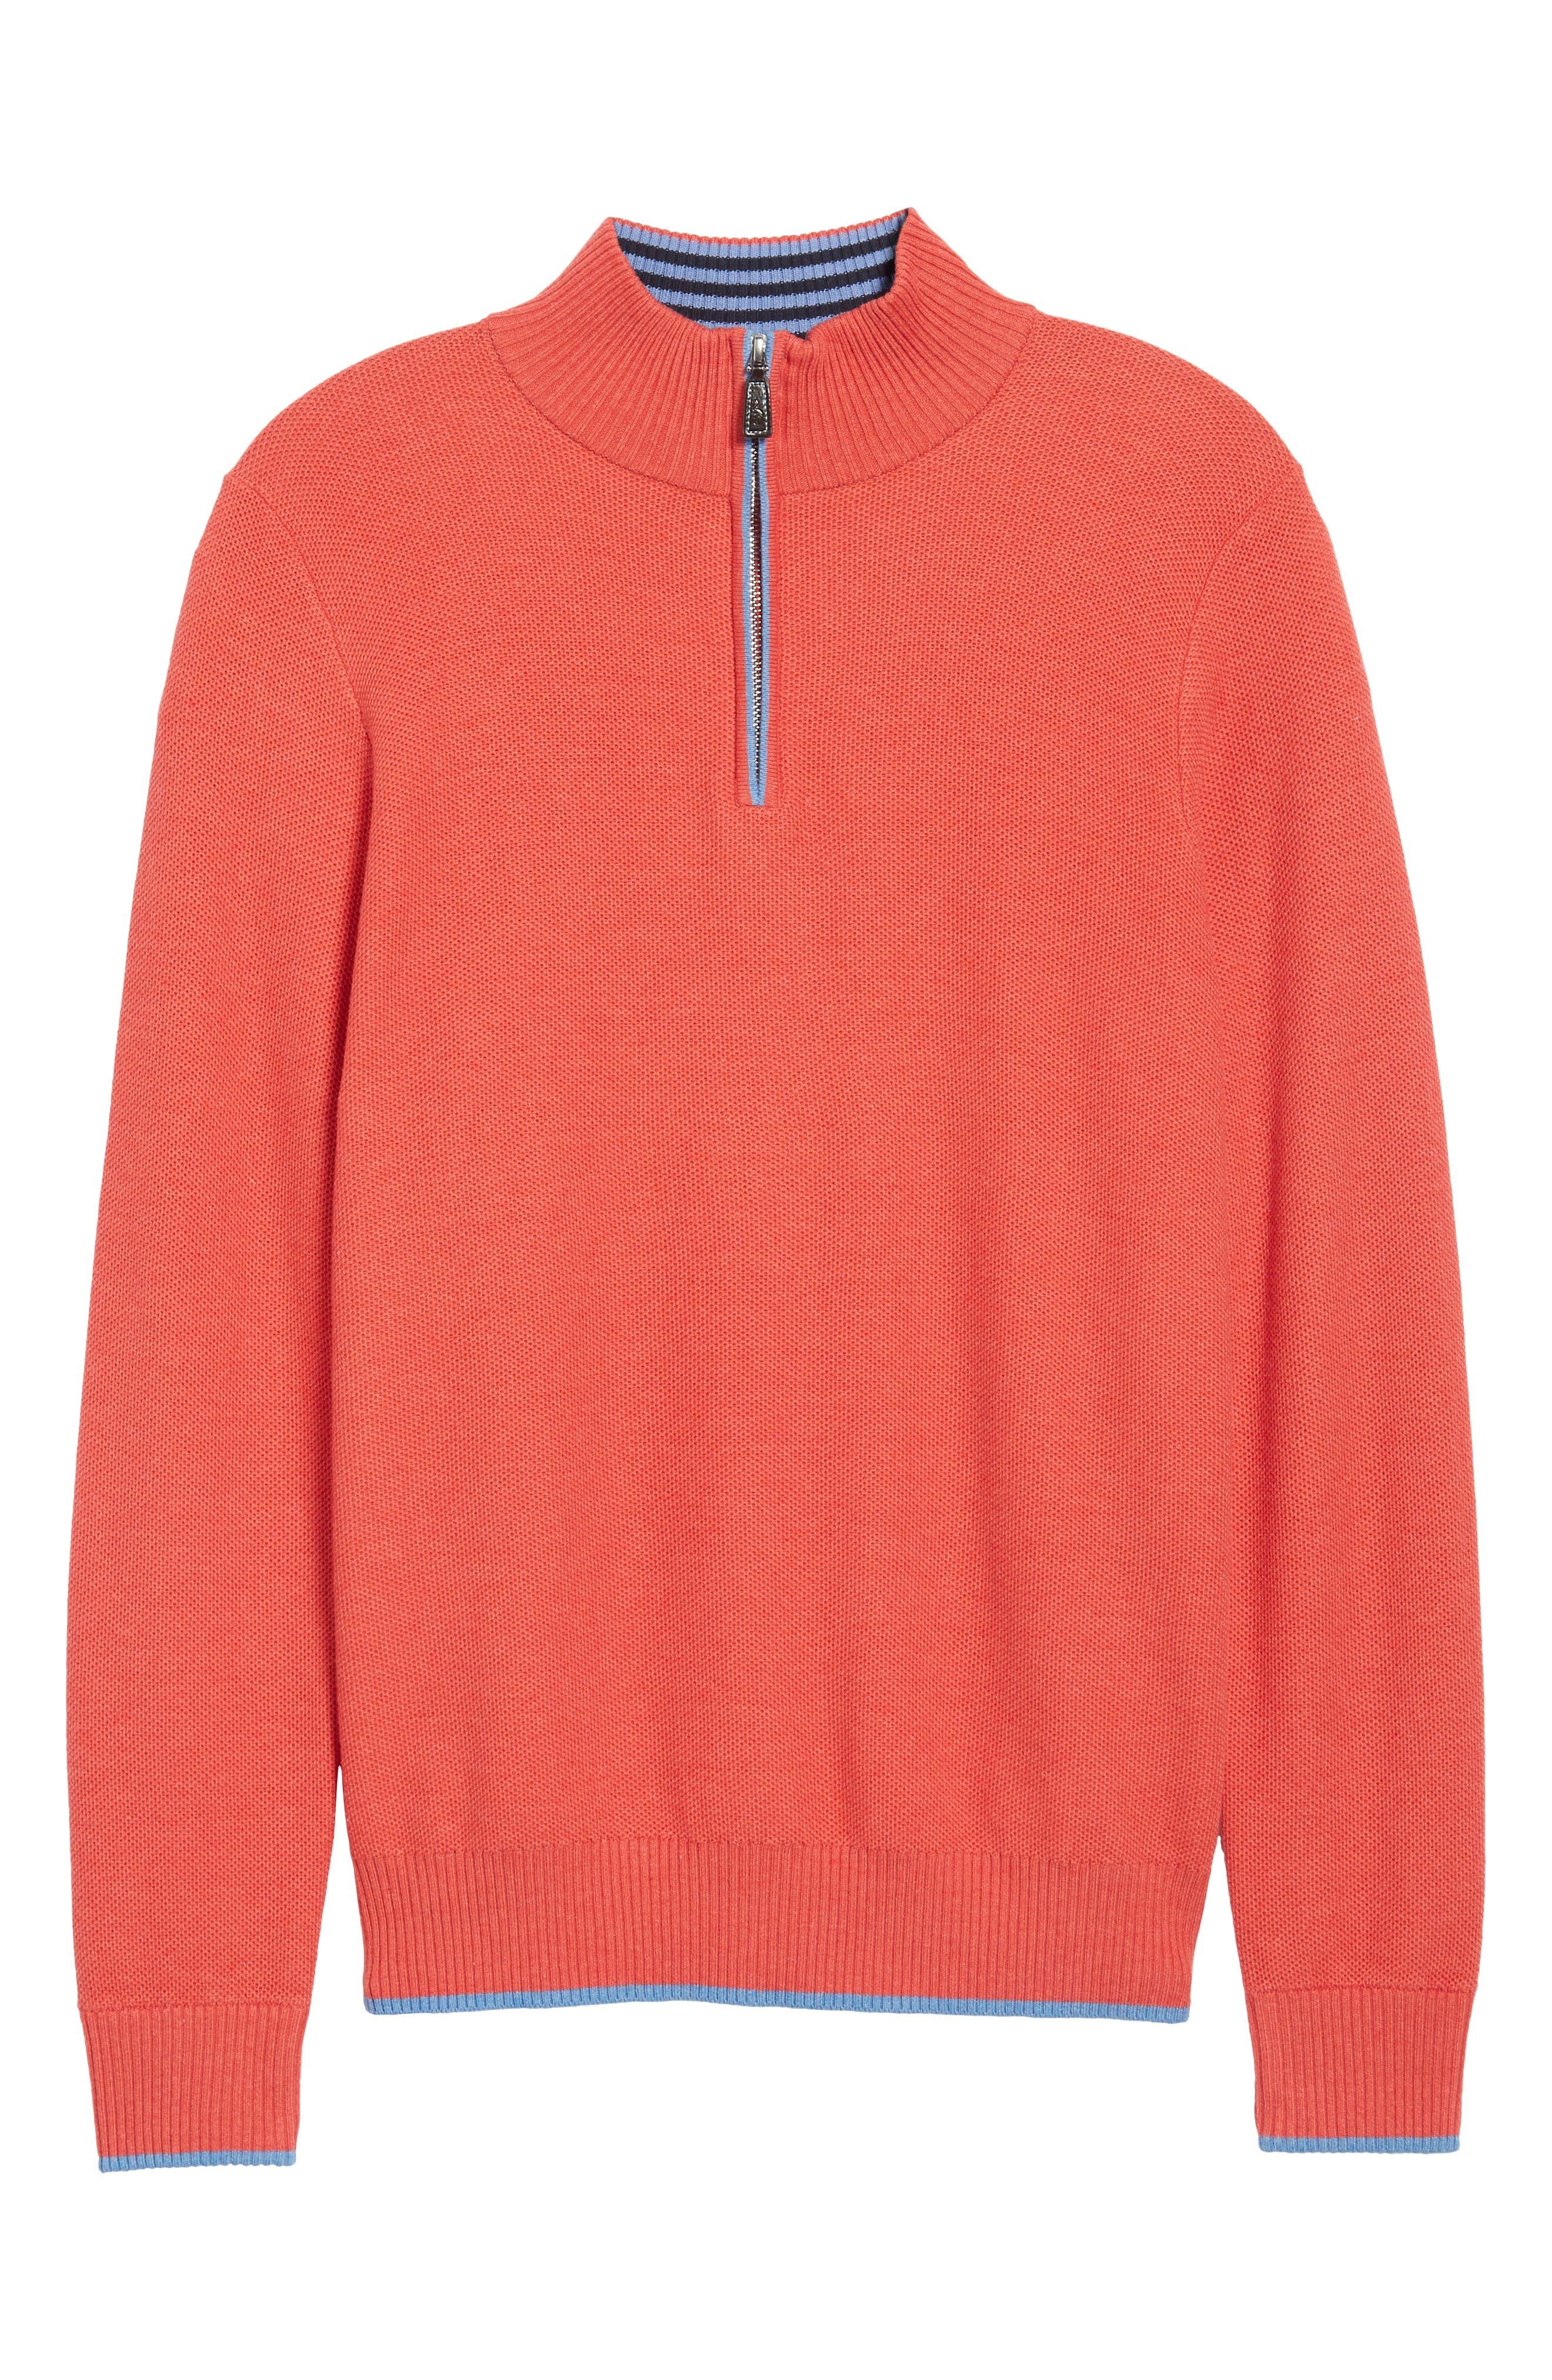 Sorrel Tipped Quarter Zip Sweater,                             Alternate thumbnail 6, color,                             950